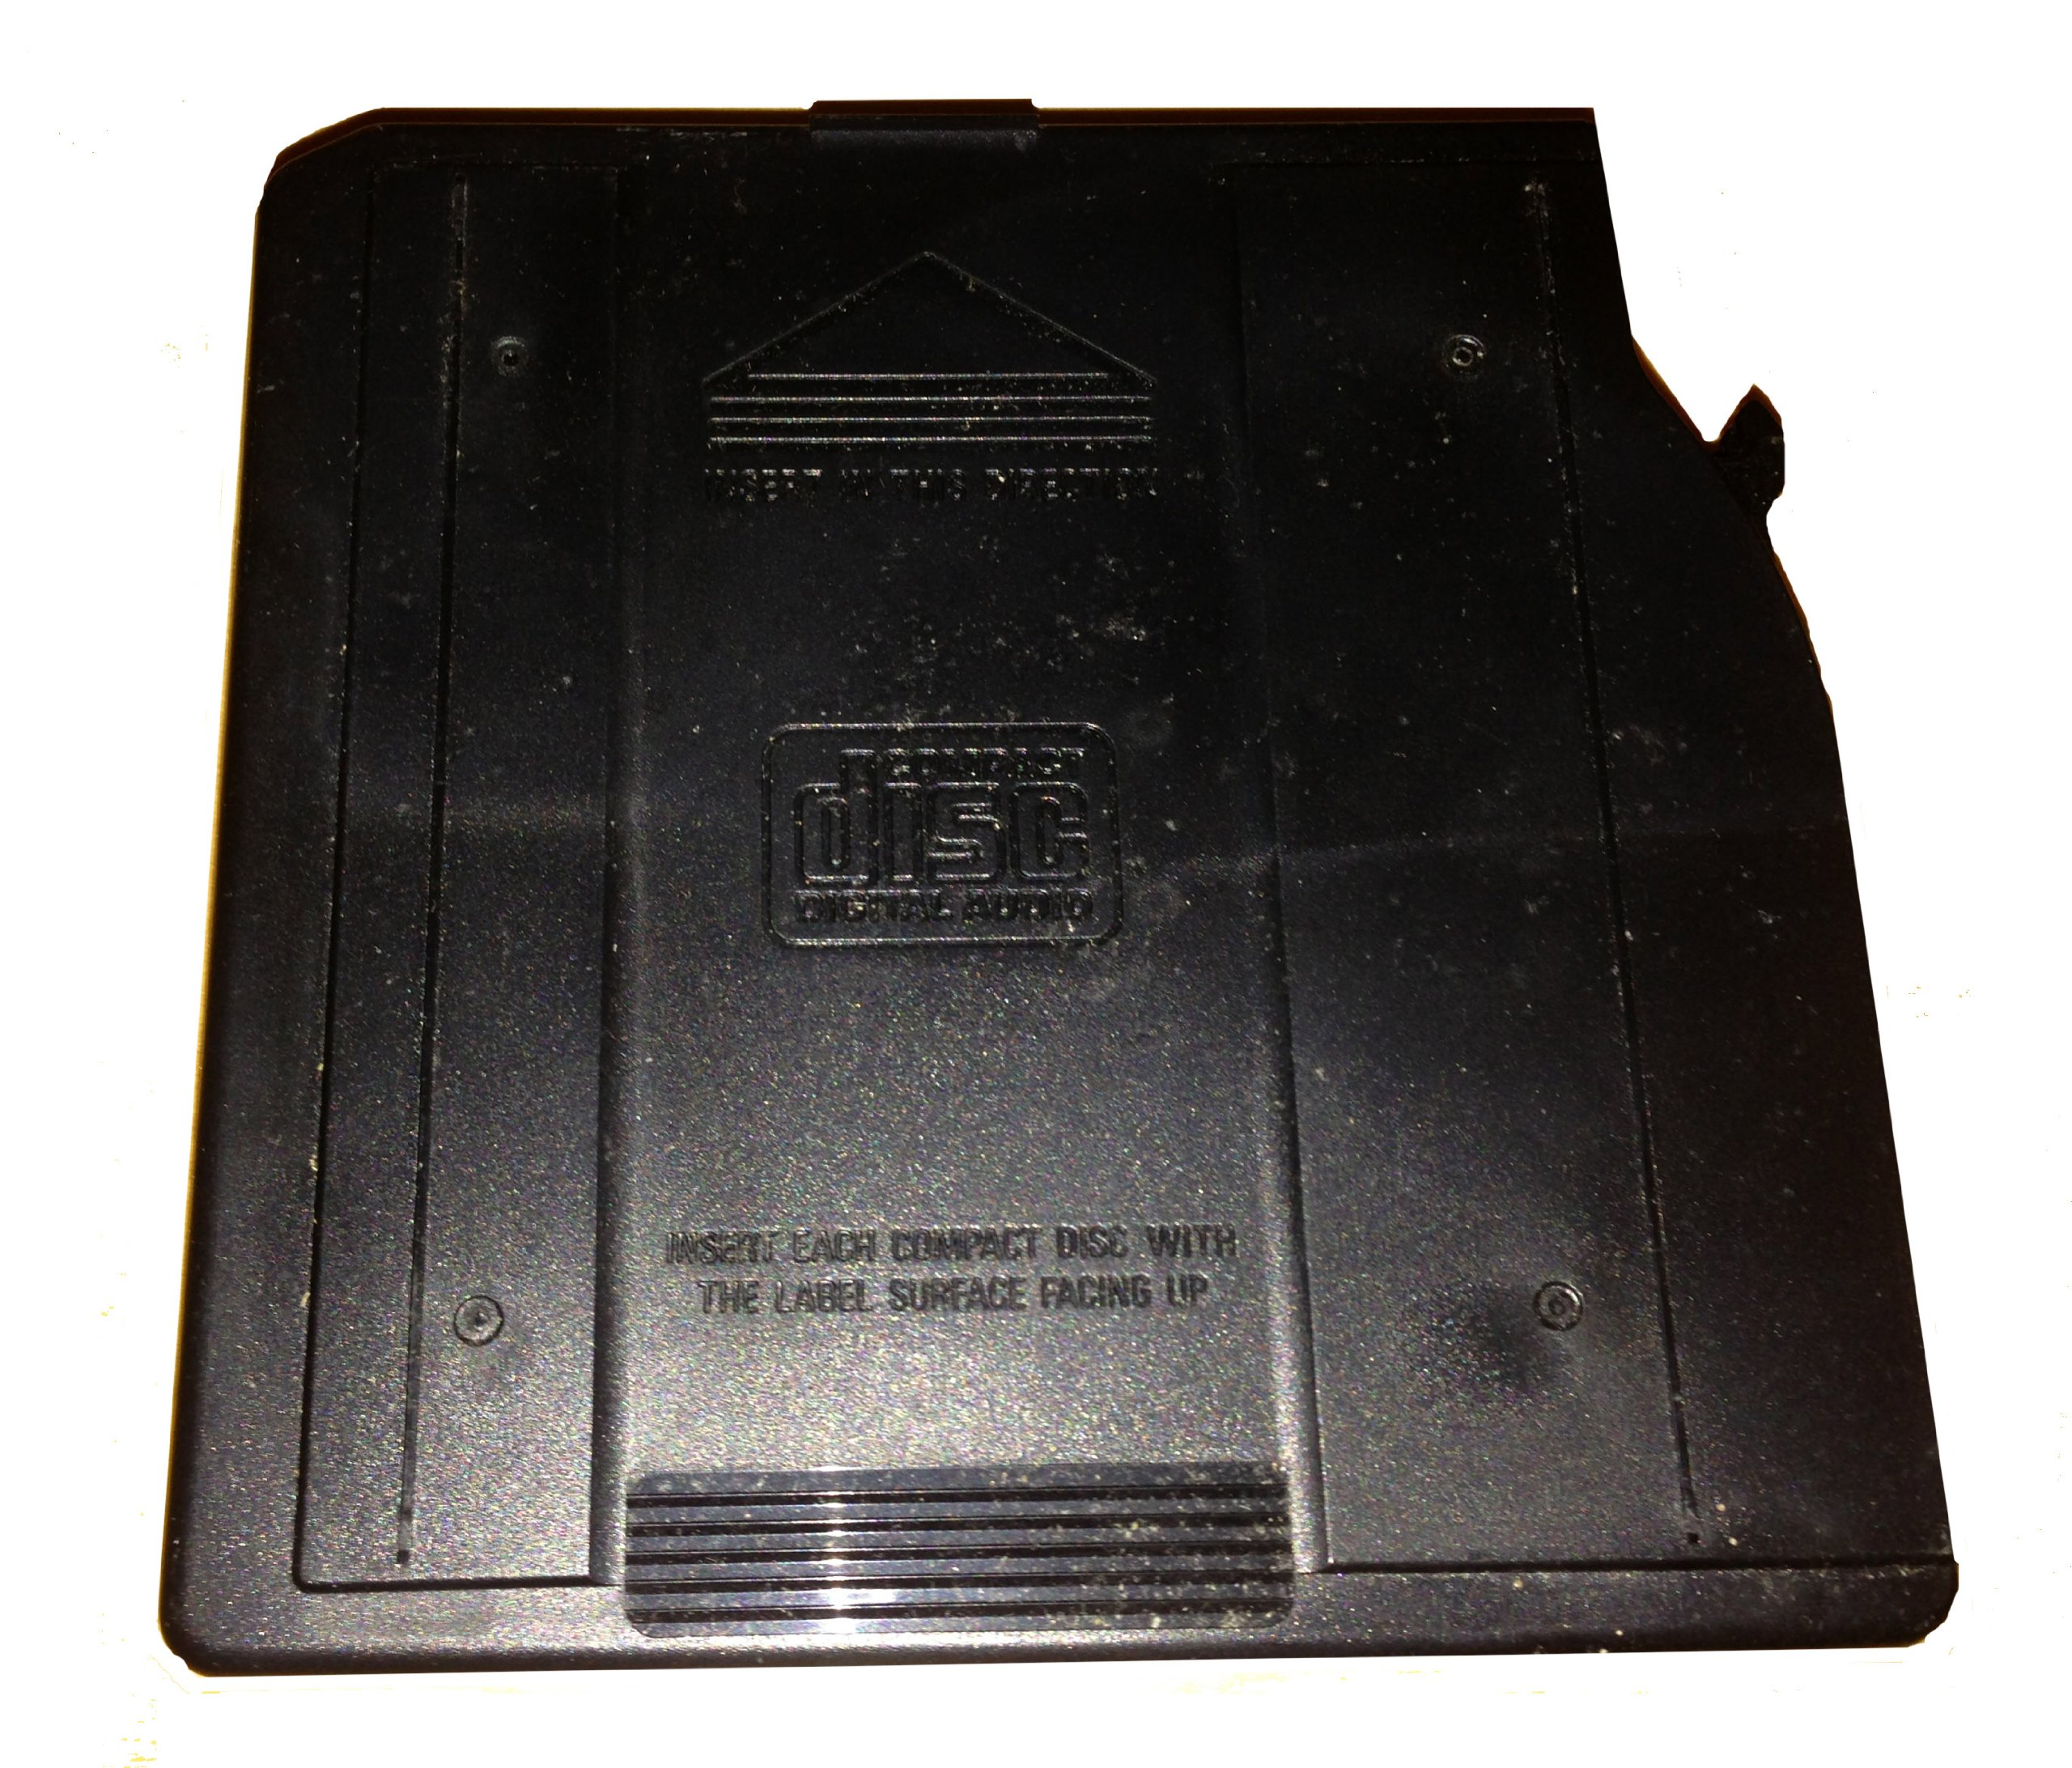 Bmw 6 Disc Cd Changer Magazine Cartridge 8 364 931 by BMW